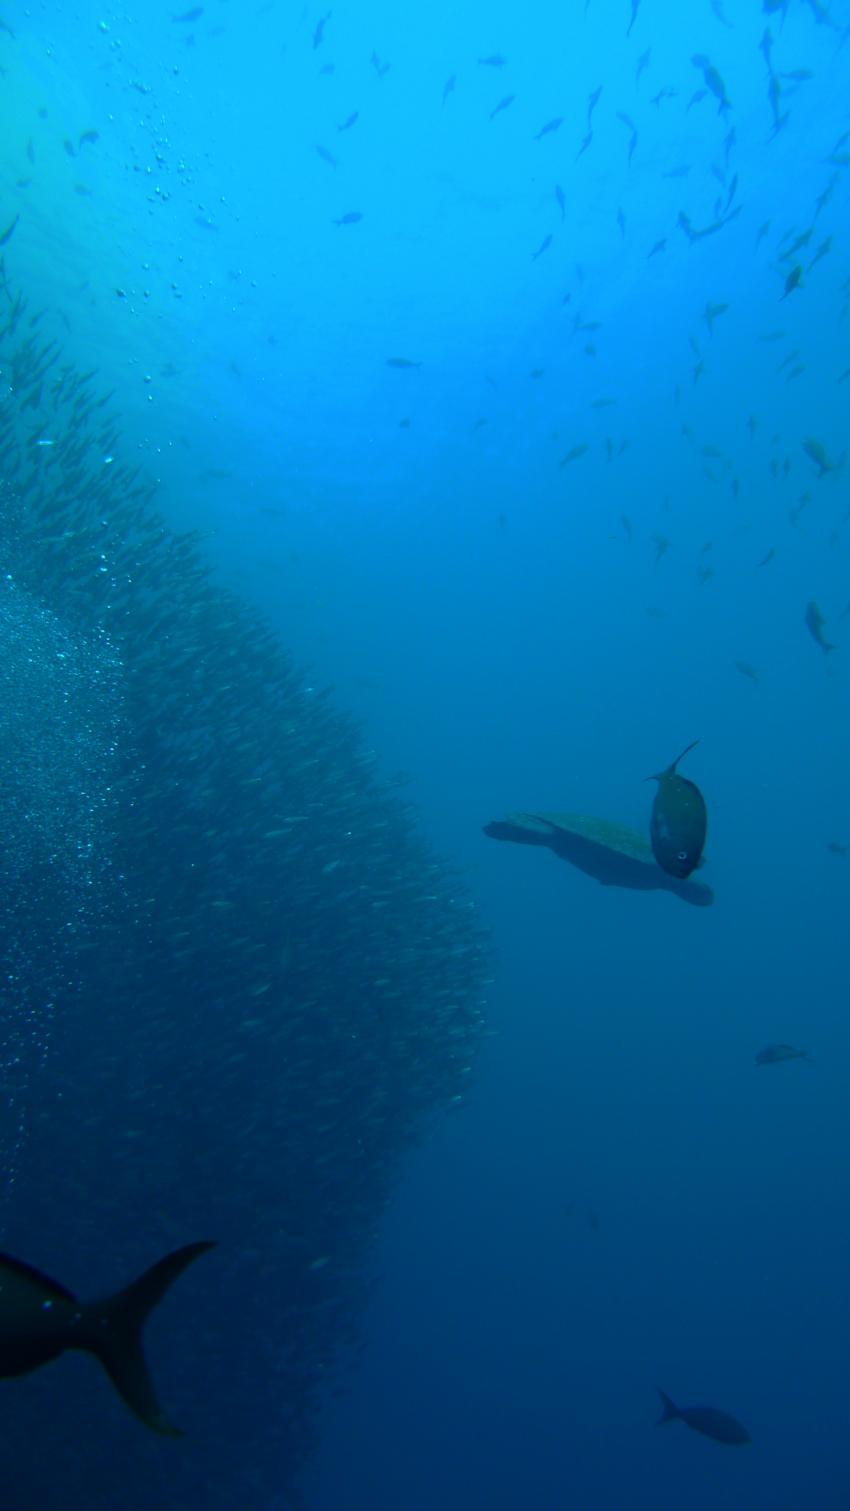 Halmahera, Halmahera,Galapagos Allgemein,Galapagos,Ecuador,Indonesien